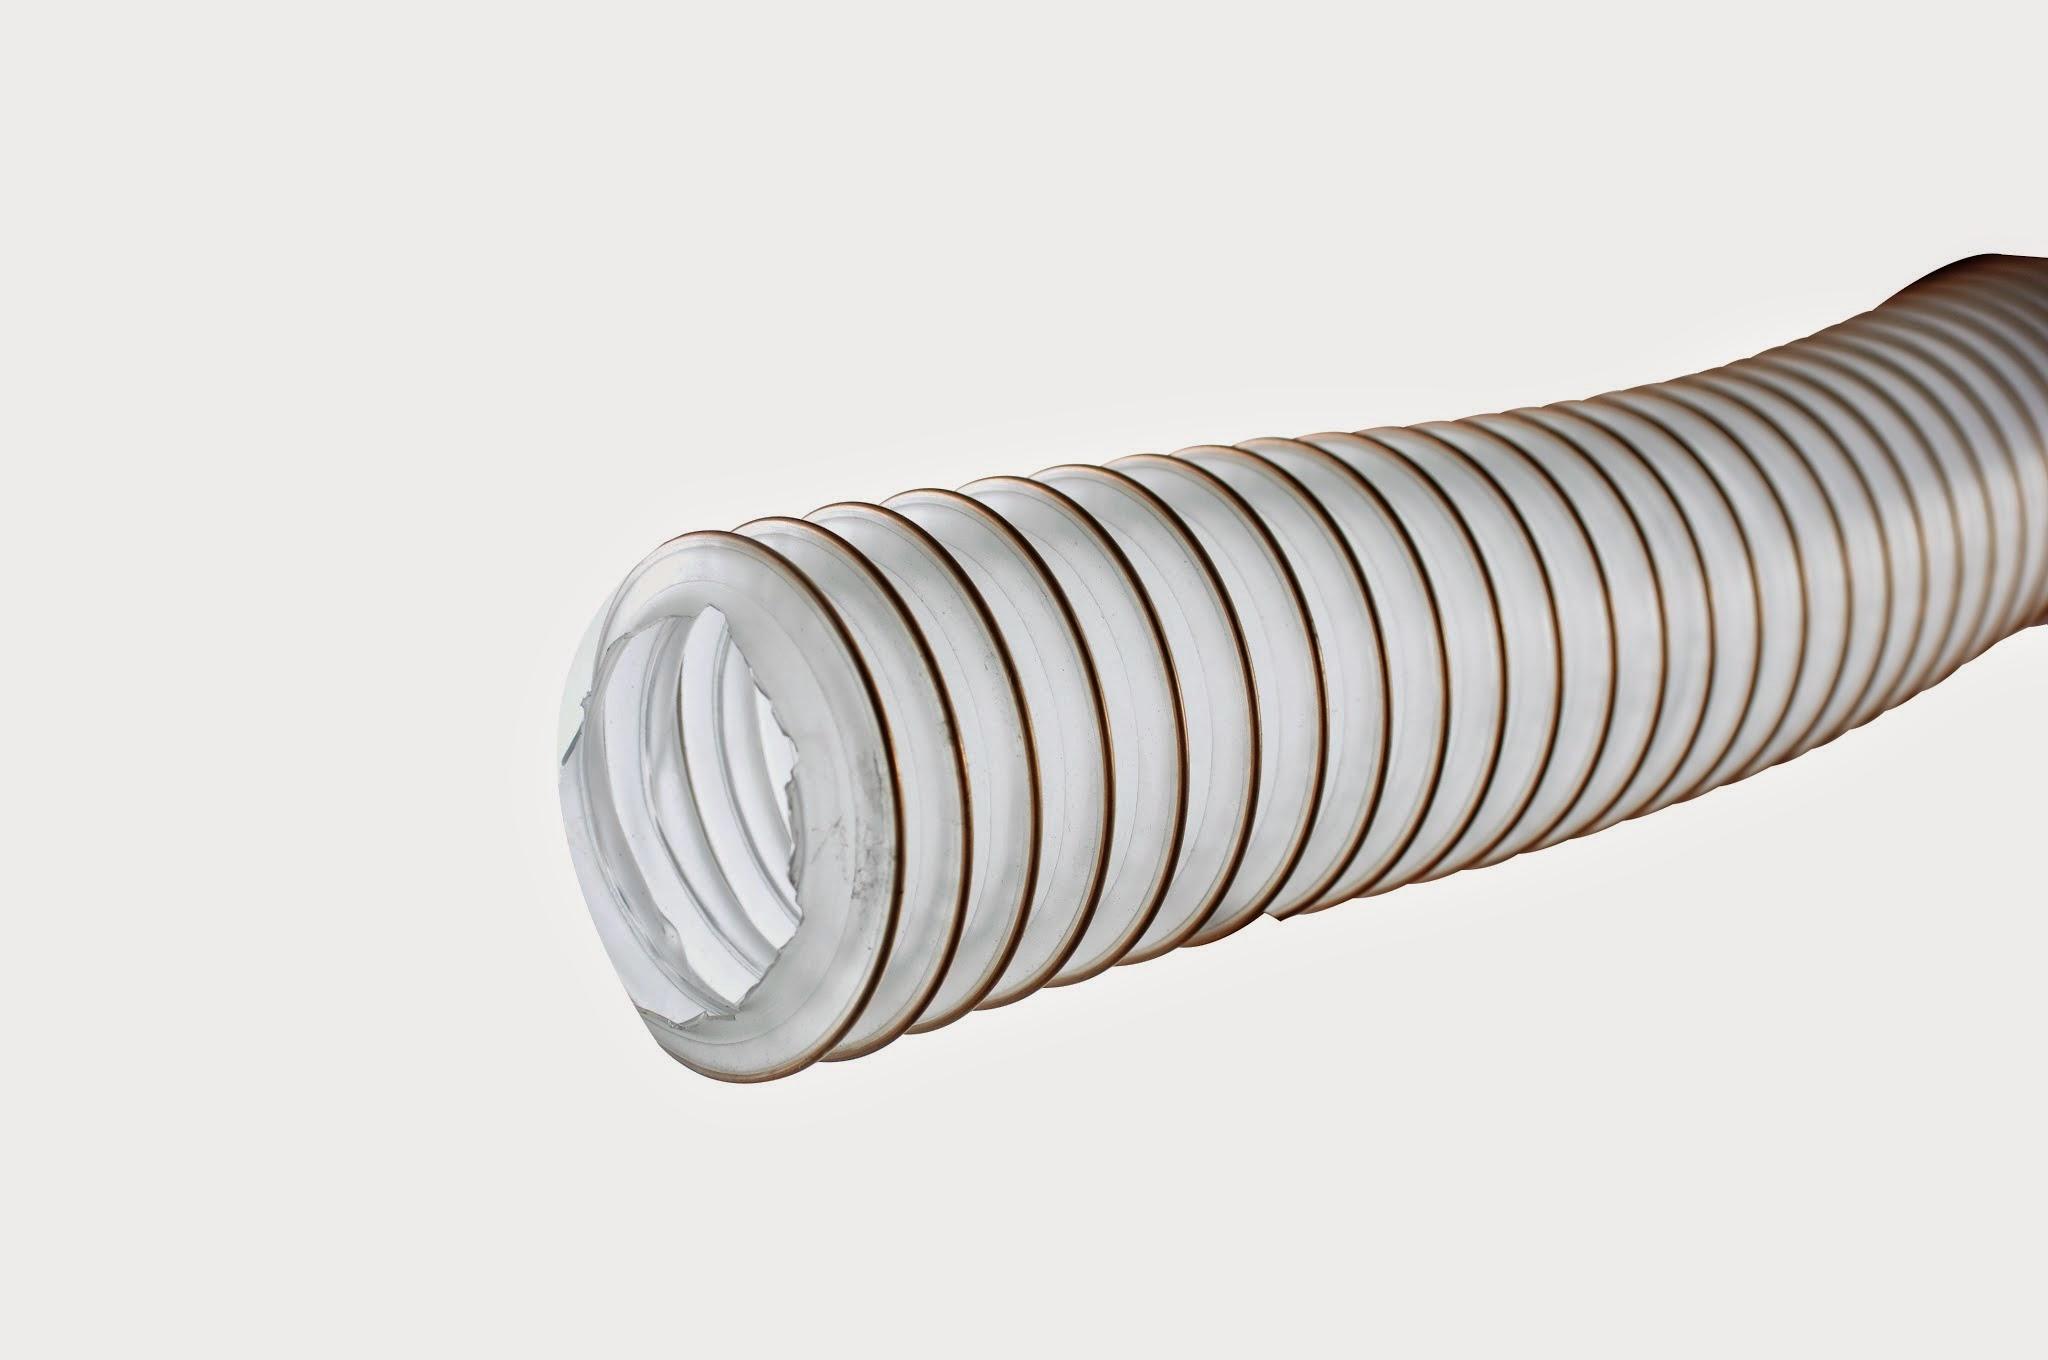 suction-hose-pu-4_23152734730_o.jpg